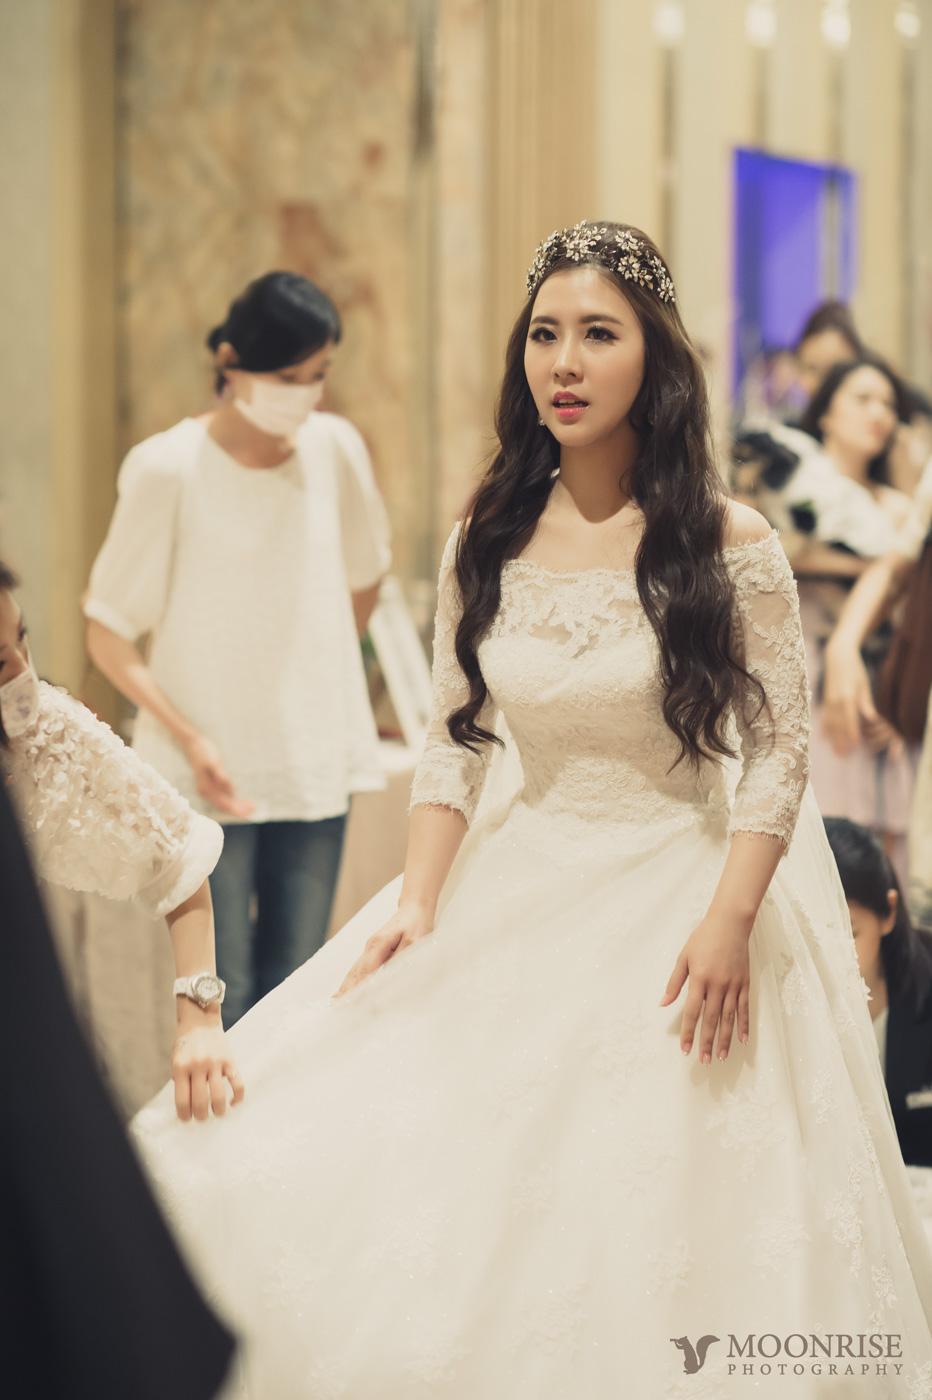 Moonrise_Wedding-0435